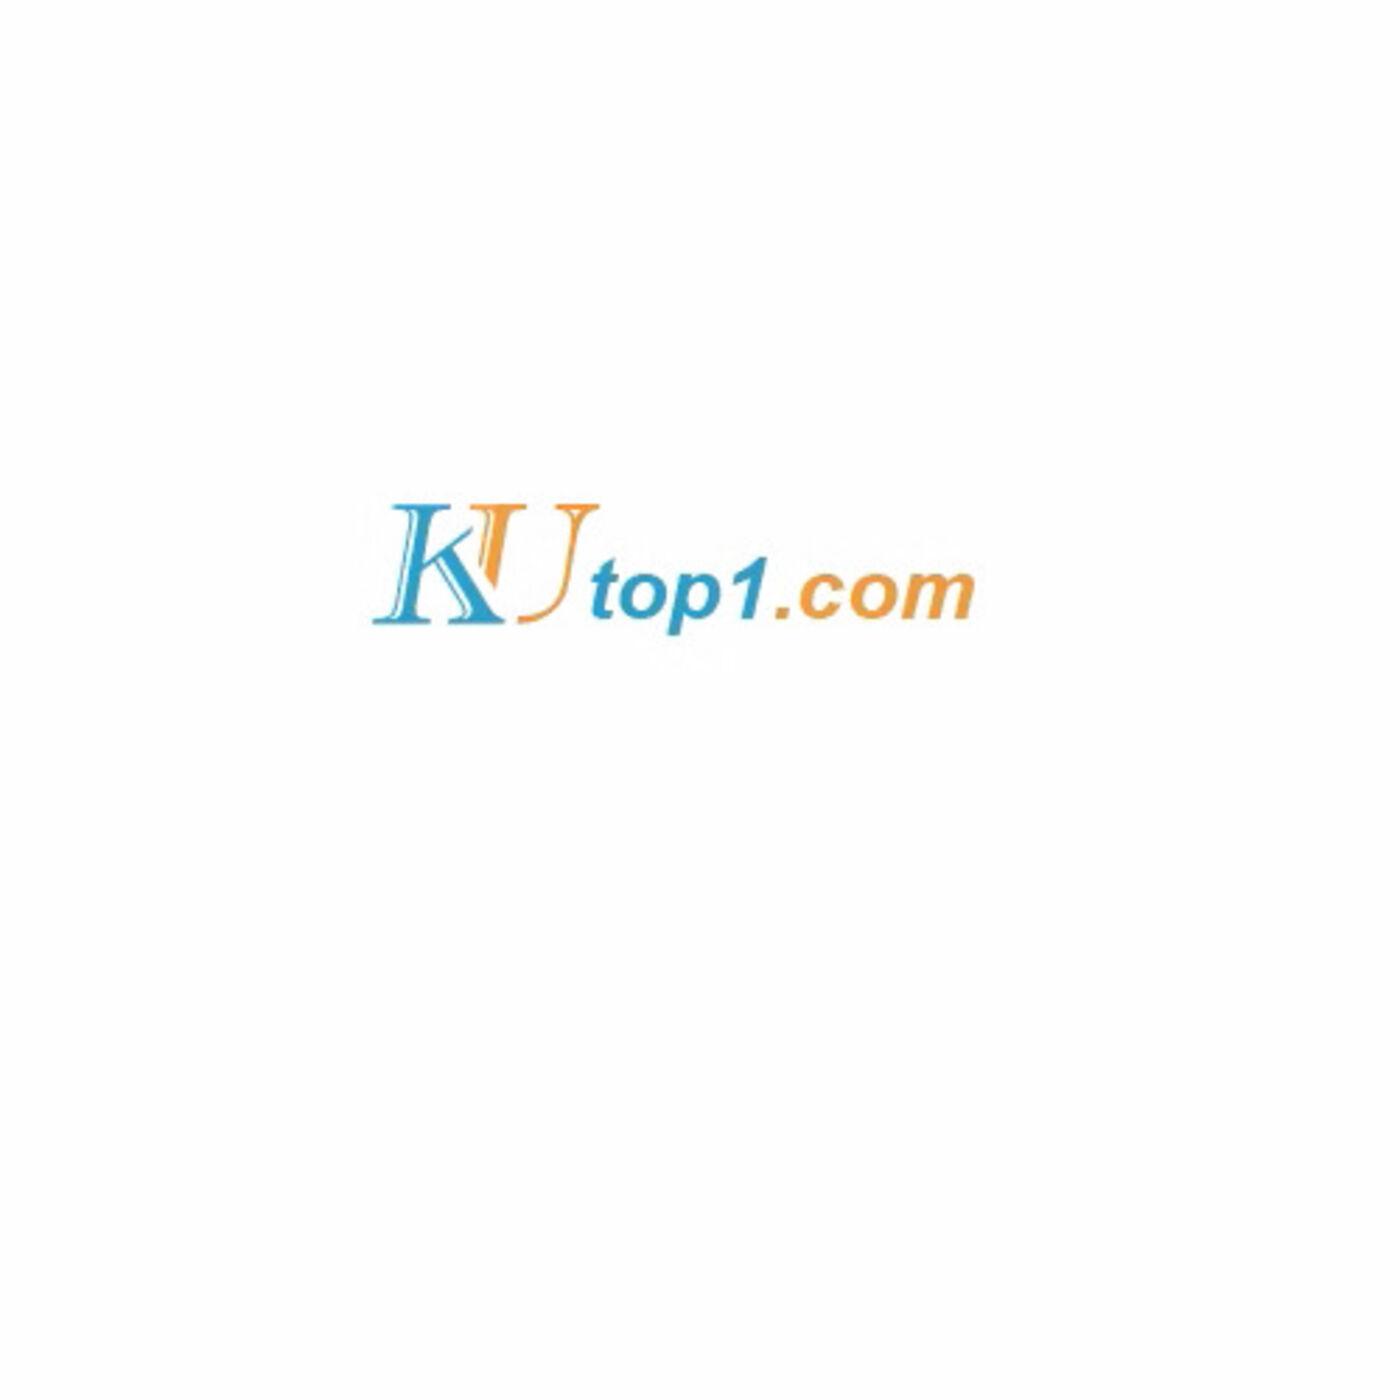 Nha cai Kubet chinh thuc tai Kutop1.com